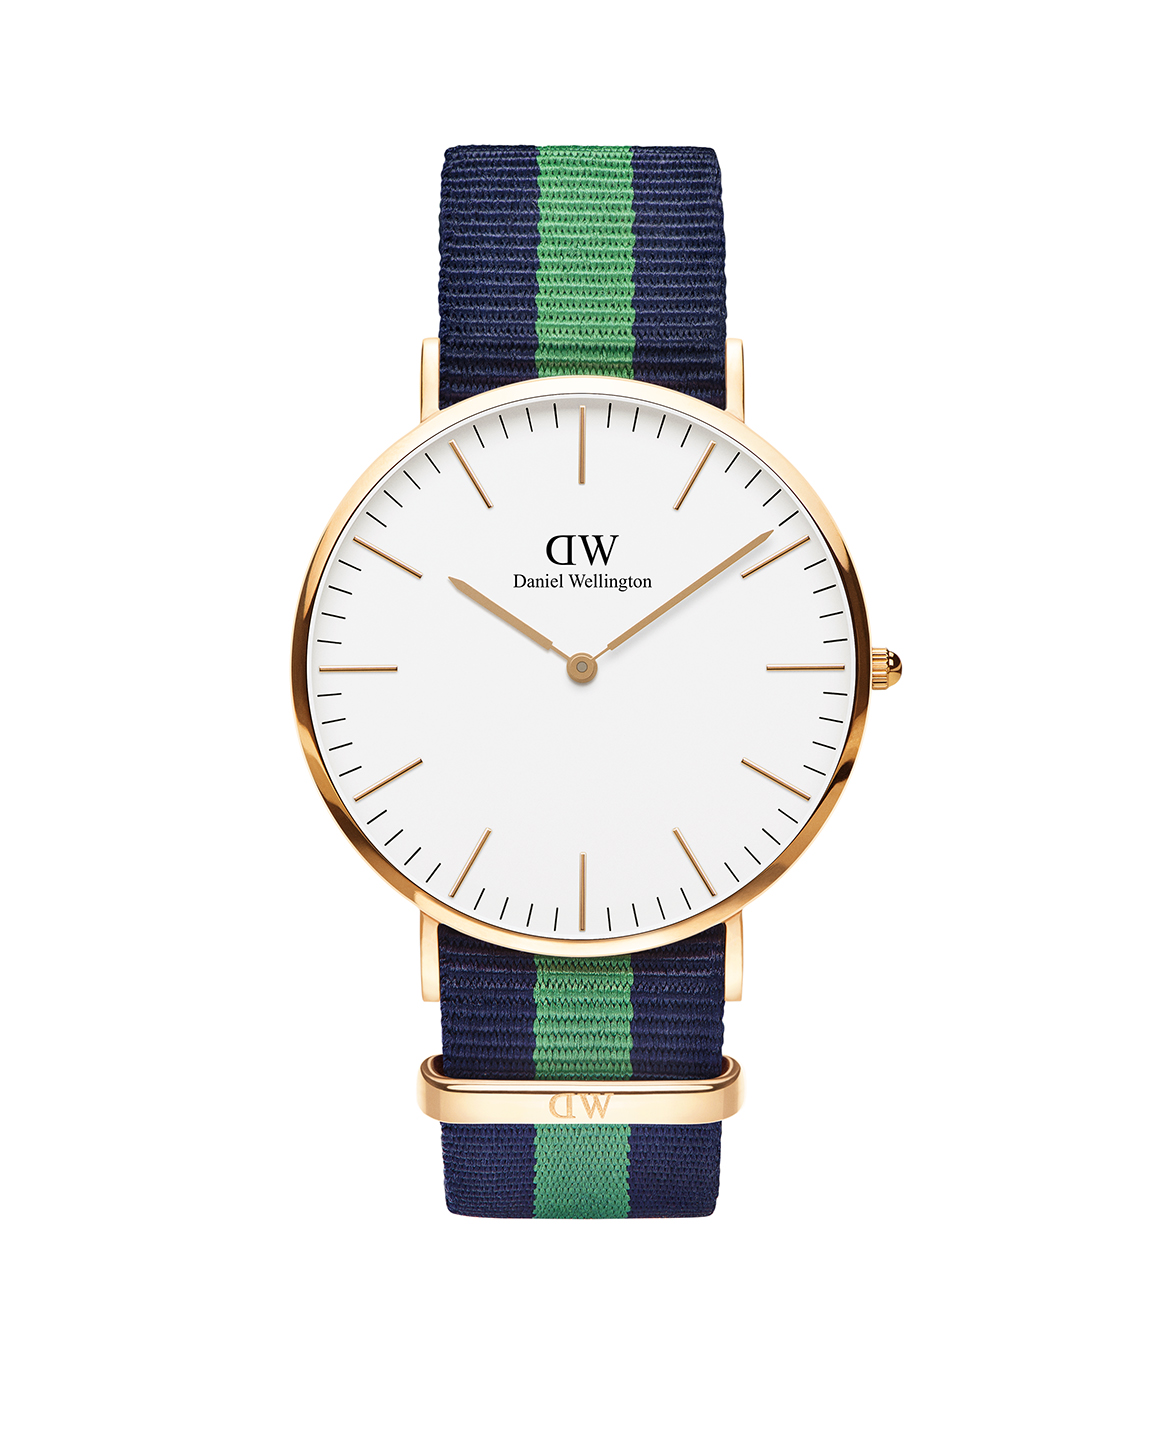 Classic Warwick watch, with NATO strap, from Daniel Wellington